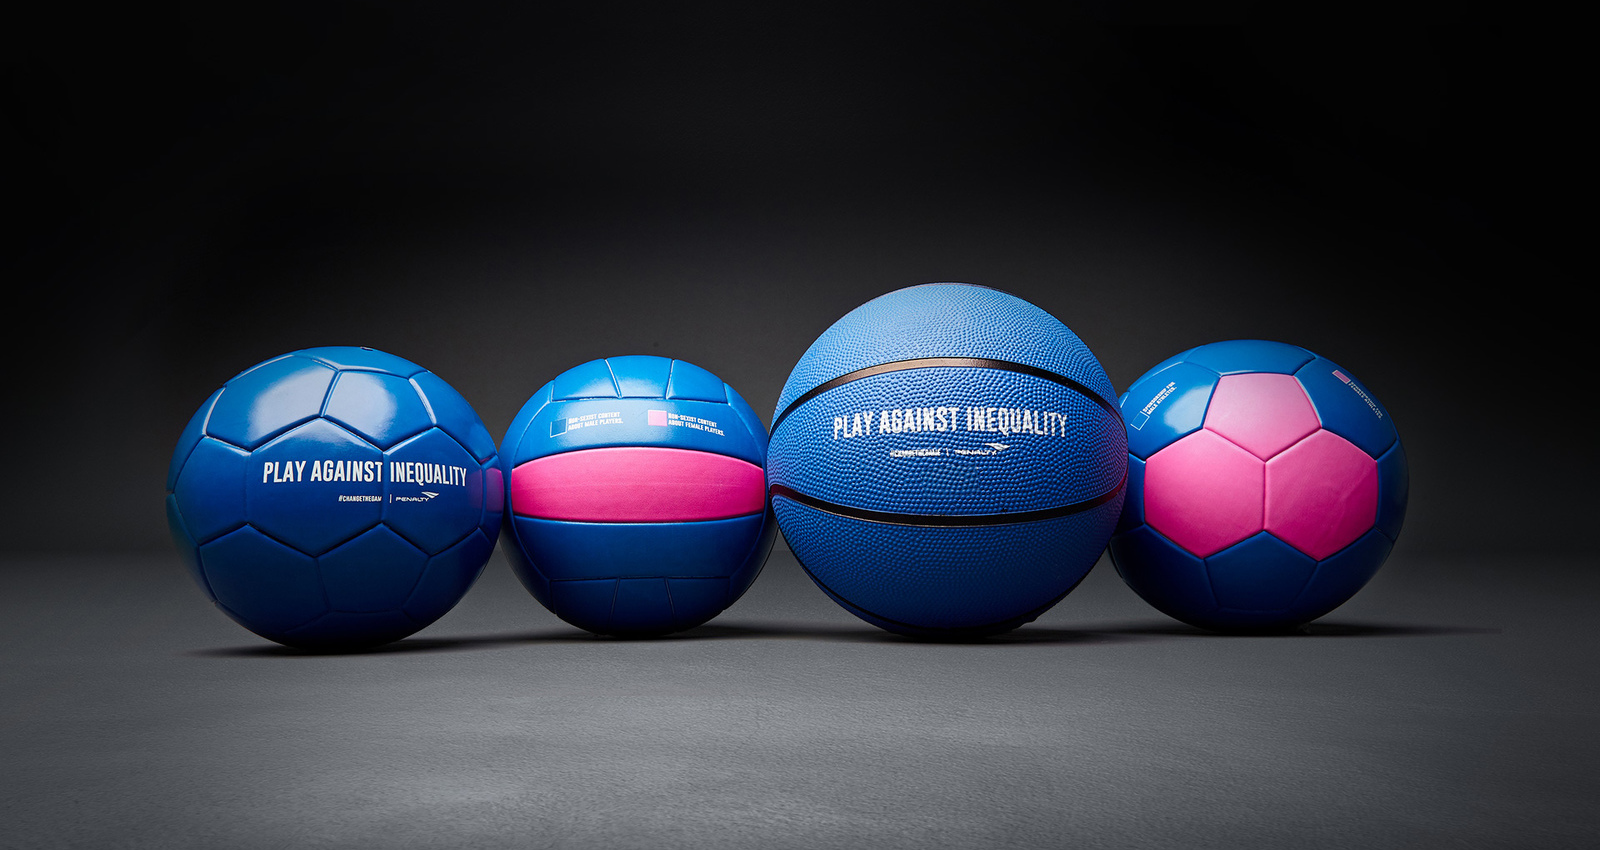 Inequality Balls